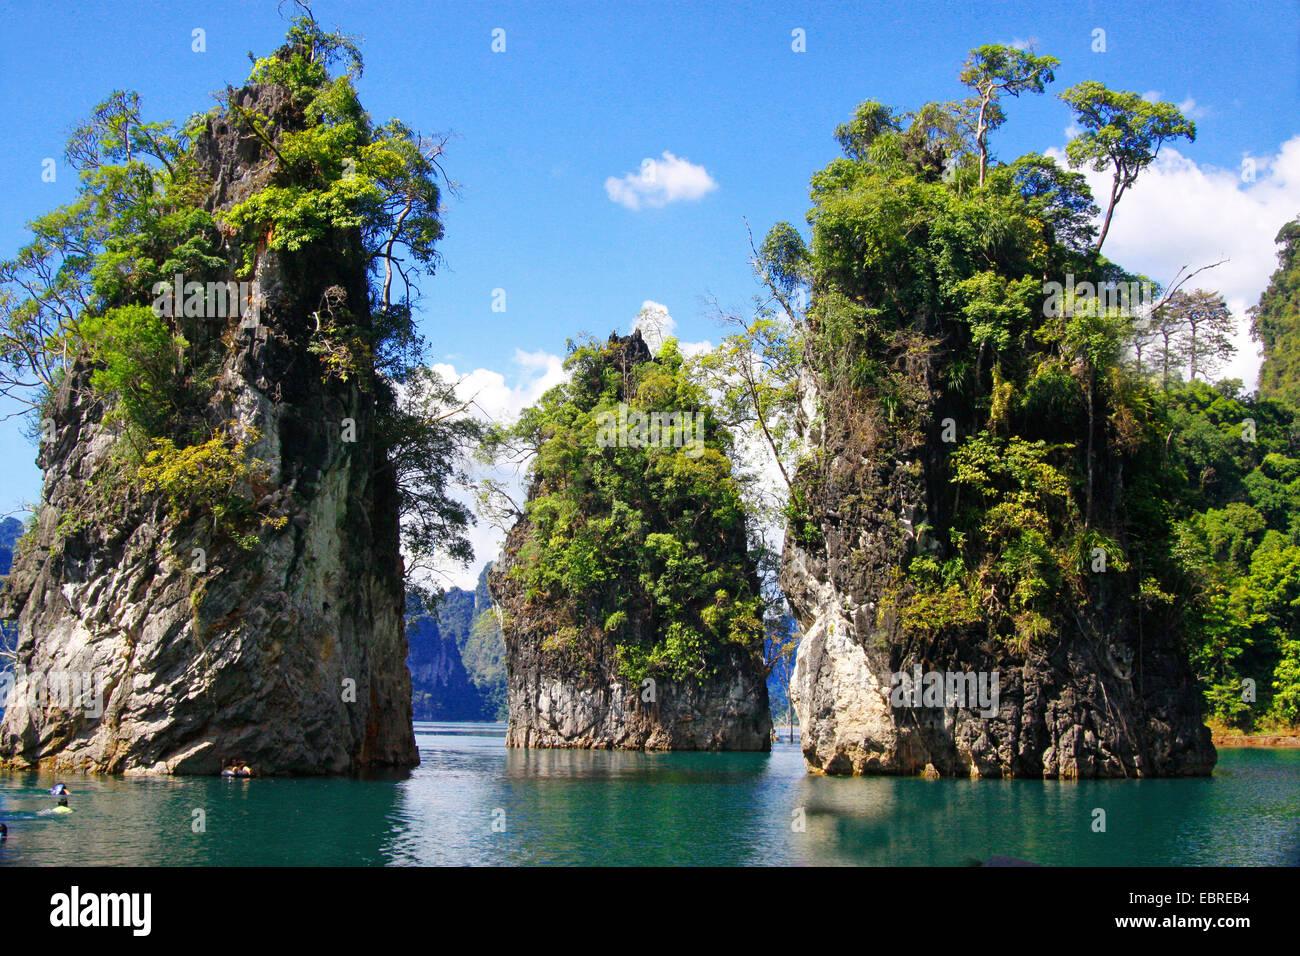 rock in the storage lake, Thailand, Khao Sok National Park - Stock Image